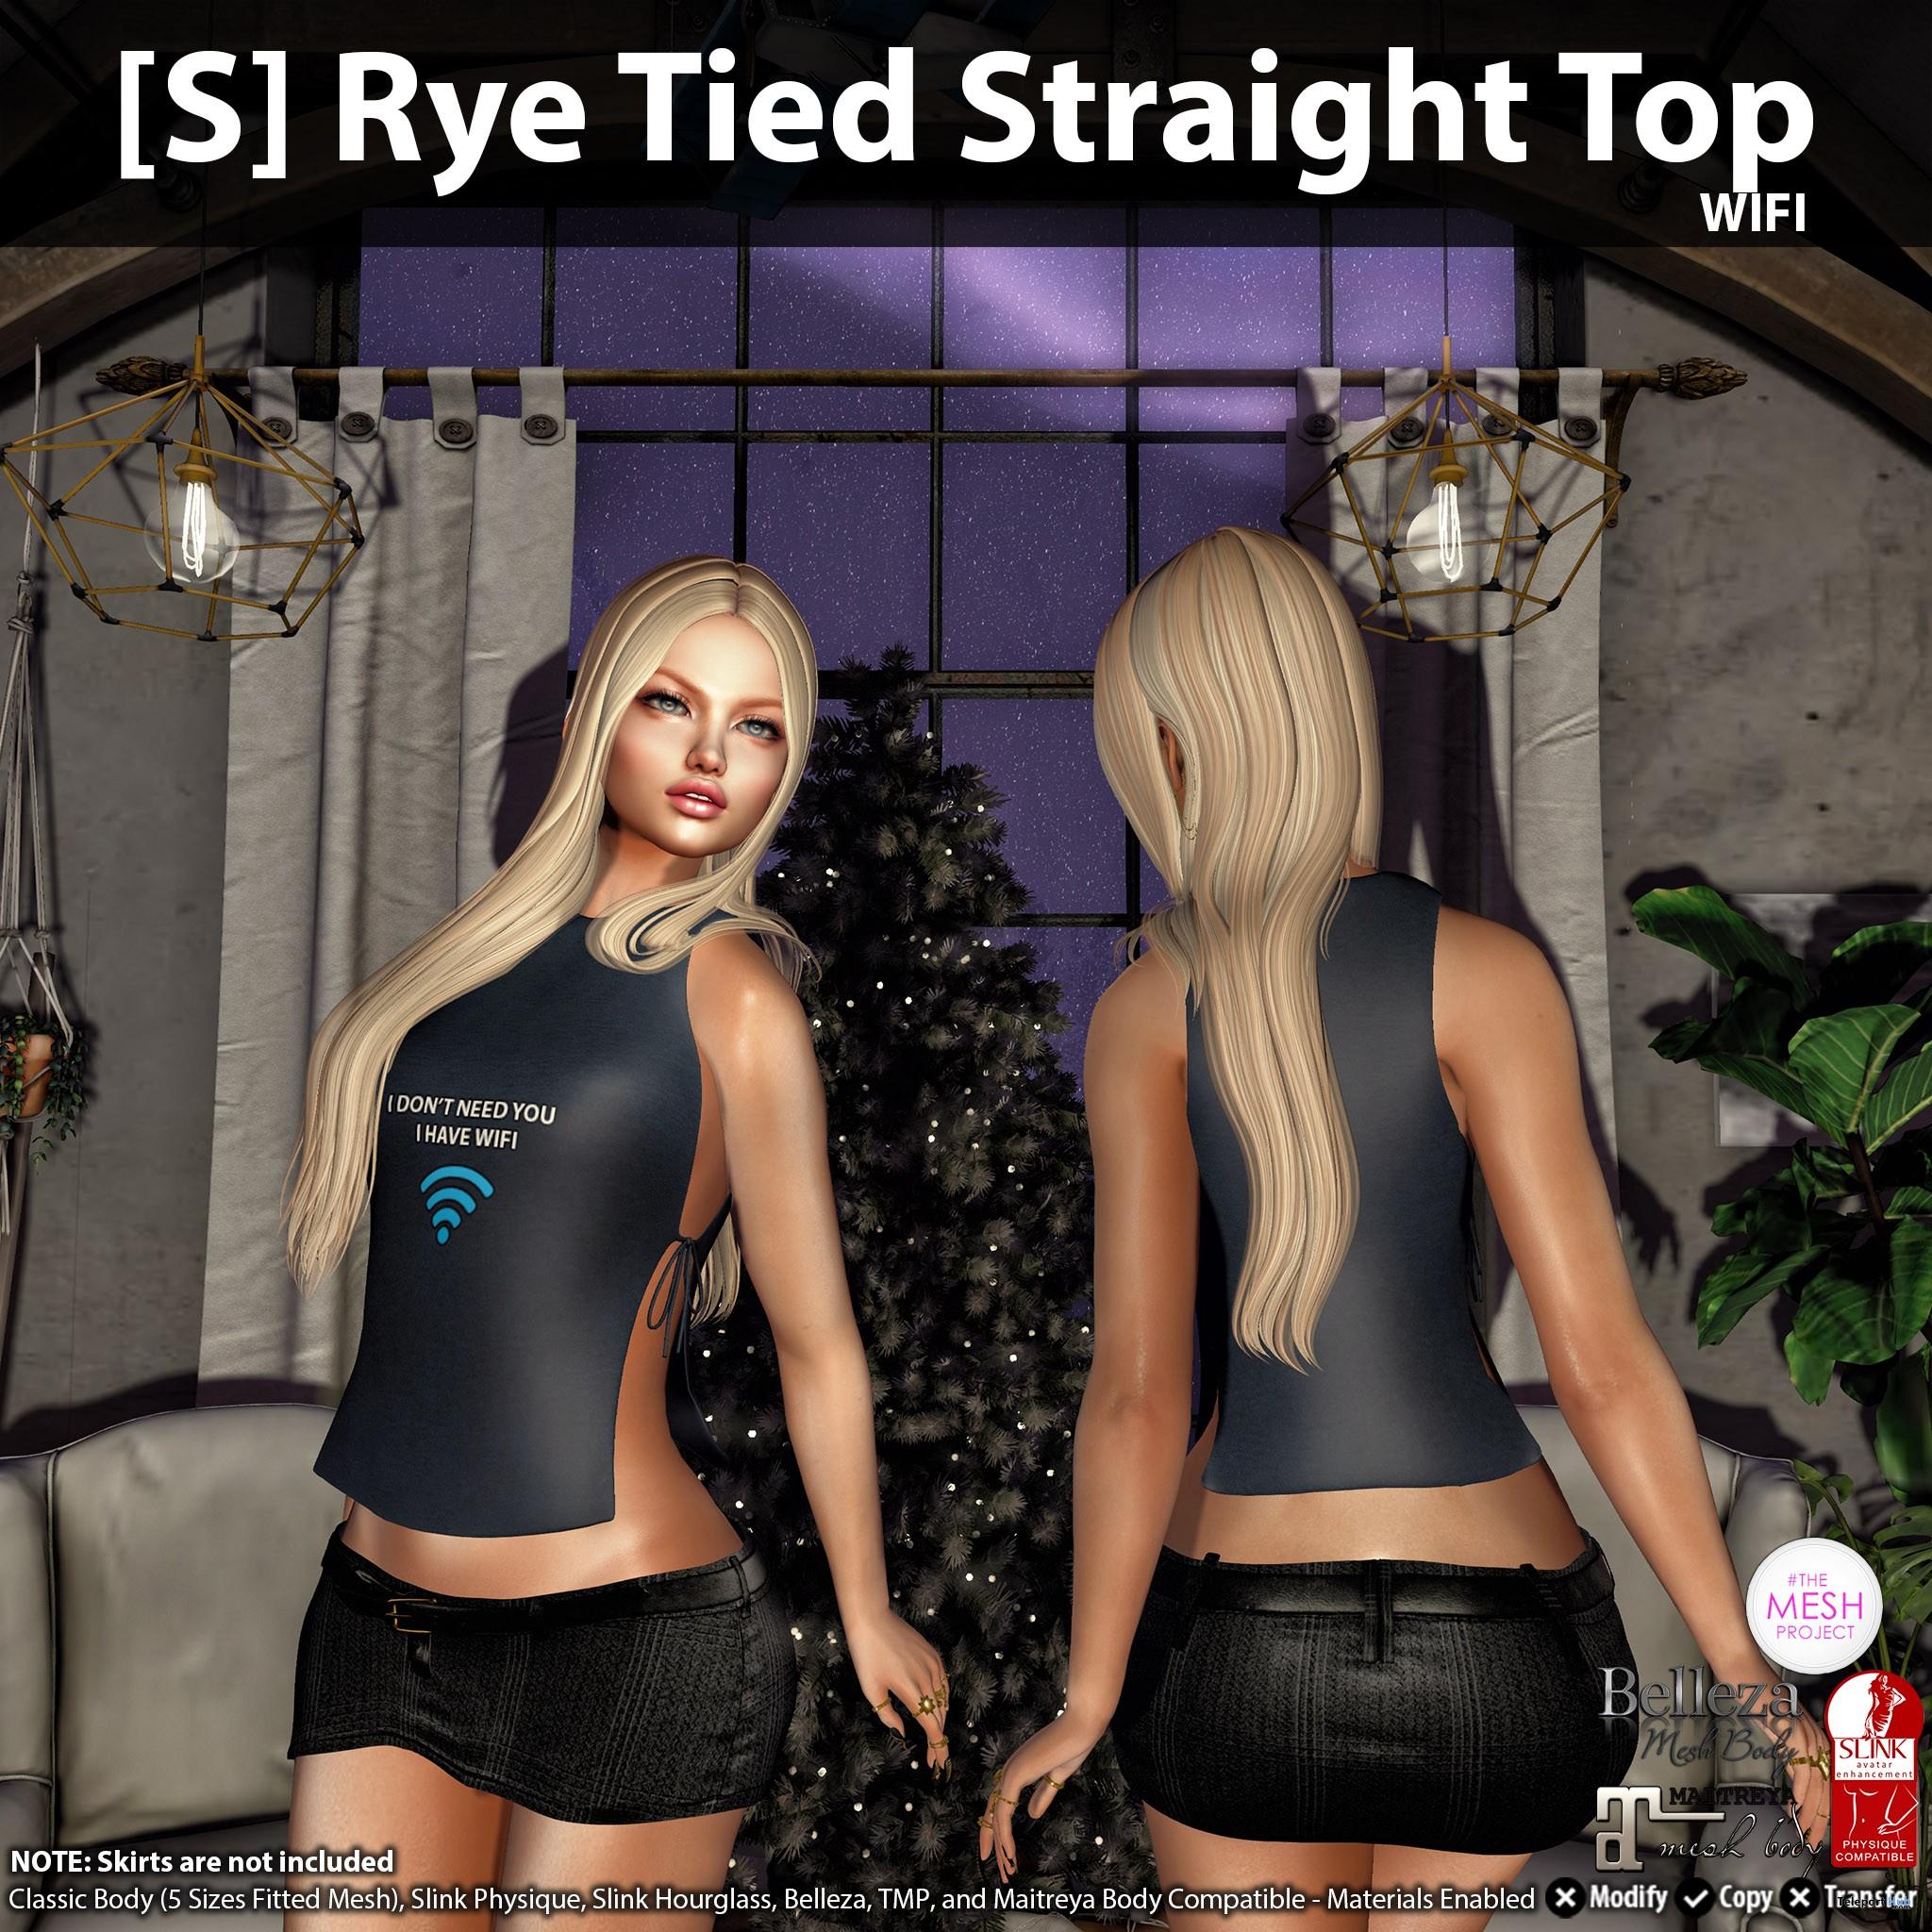 [S] Rye Tied Straight Top Wifi Teleport Hub Group Gift by [satus Inc] - Teleport Hub - teleporthub.com